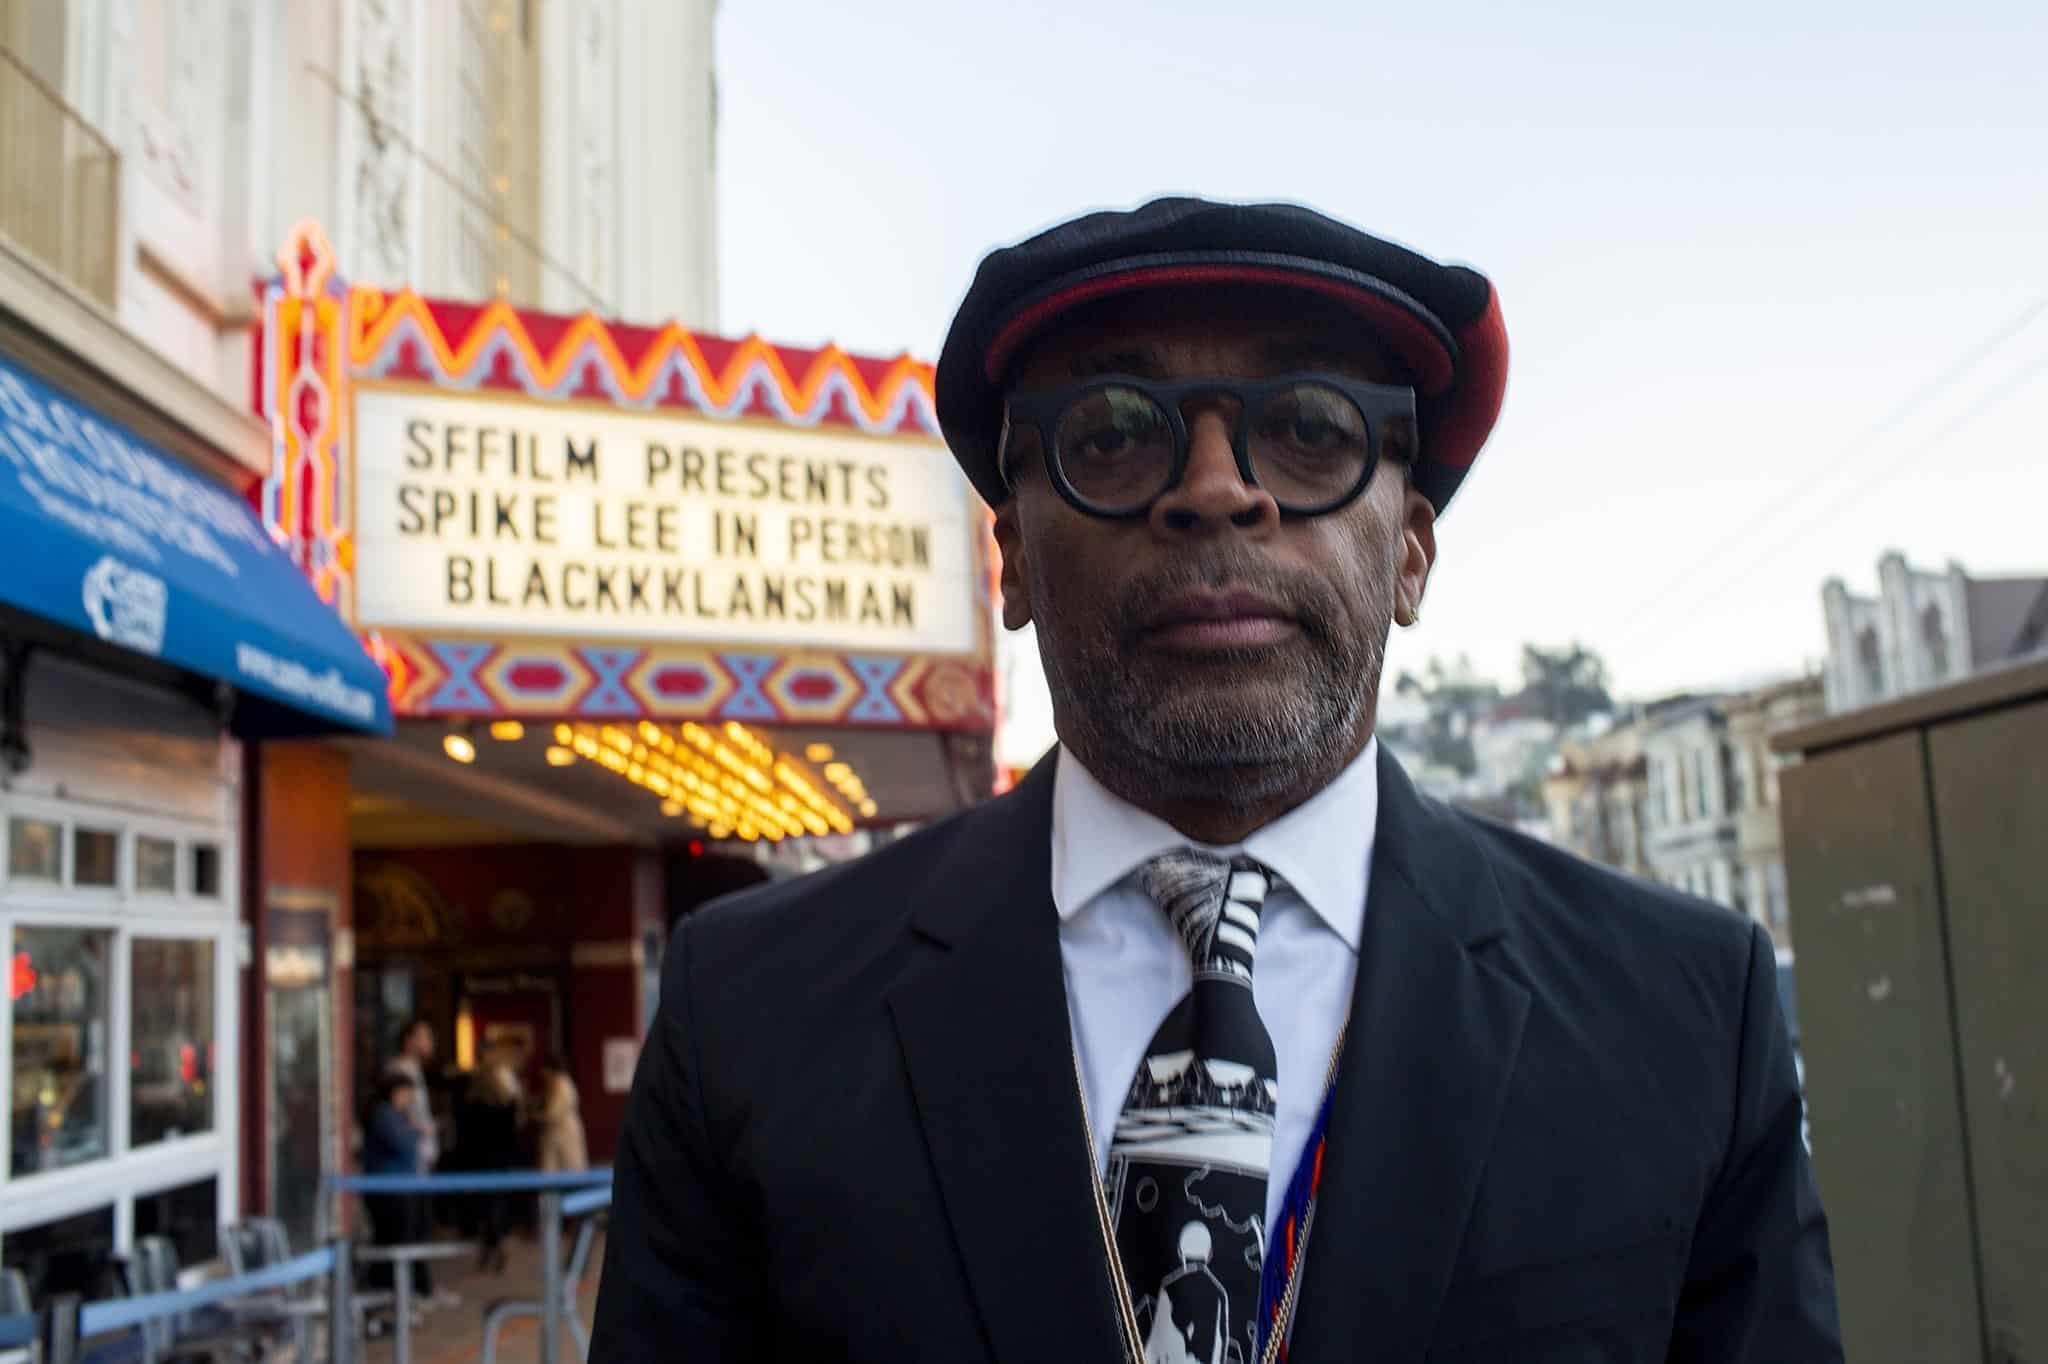 BlacKkKlansman - Interview with director Spike Lee